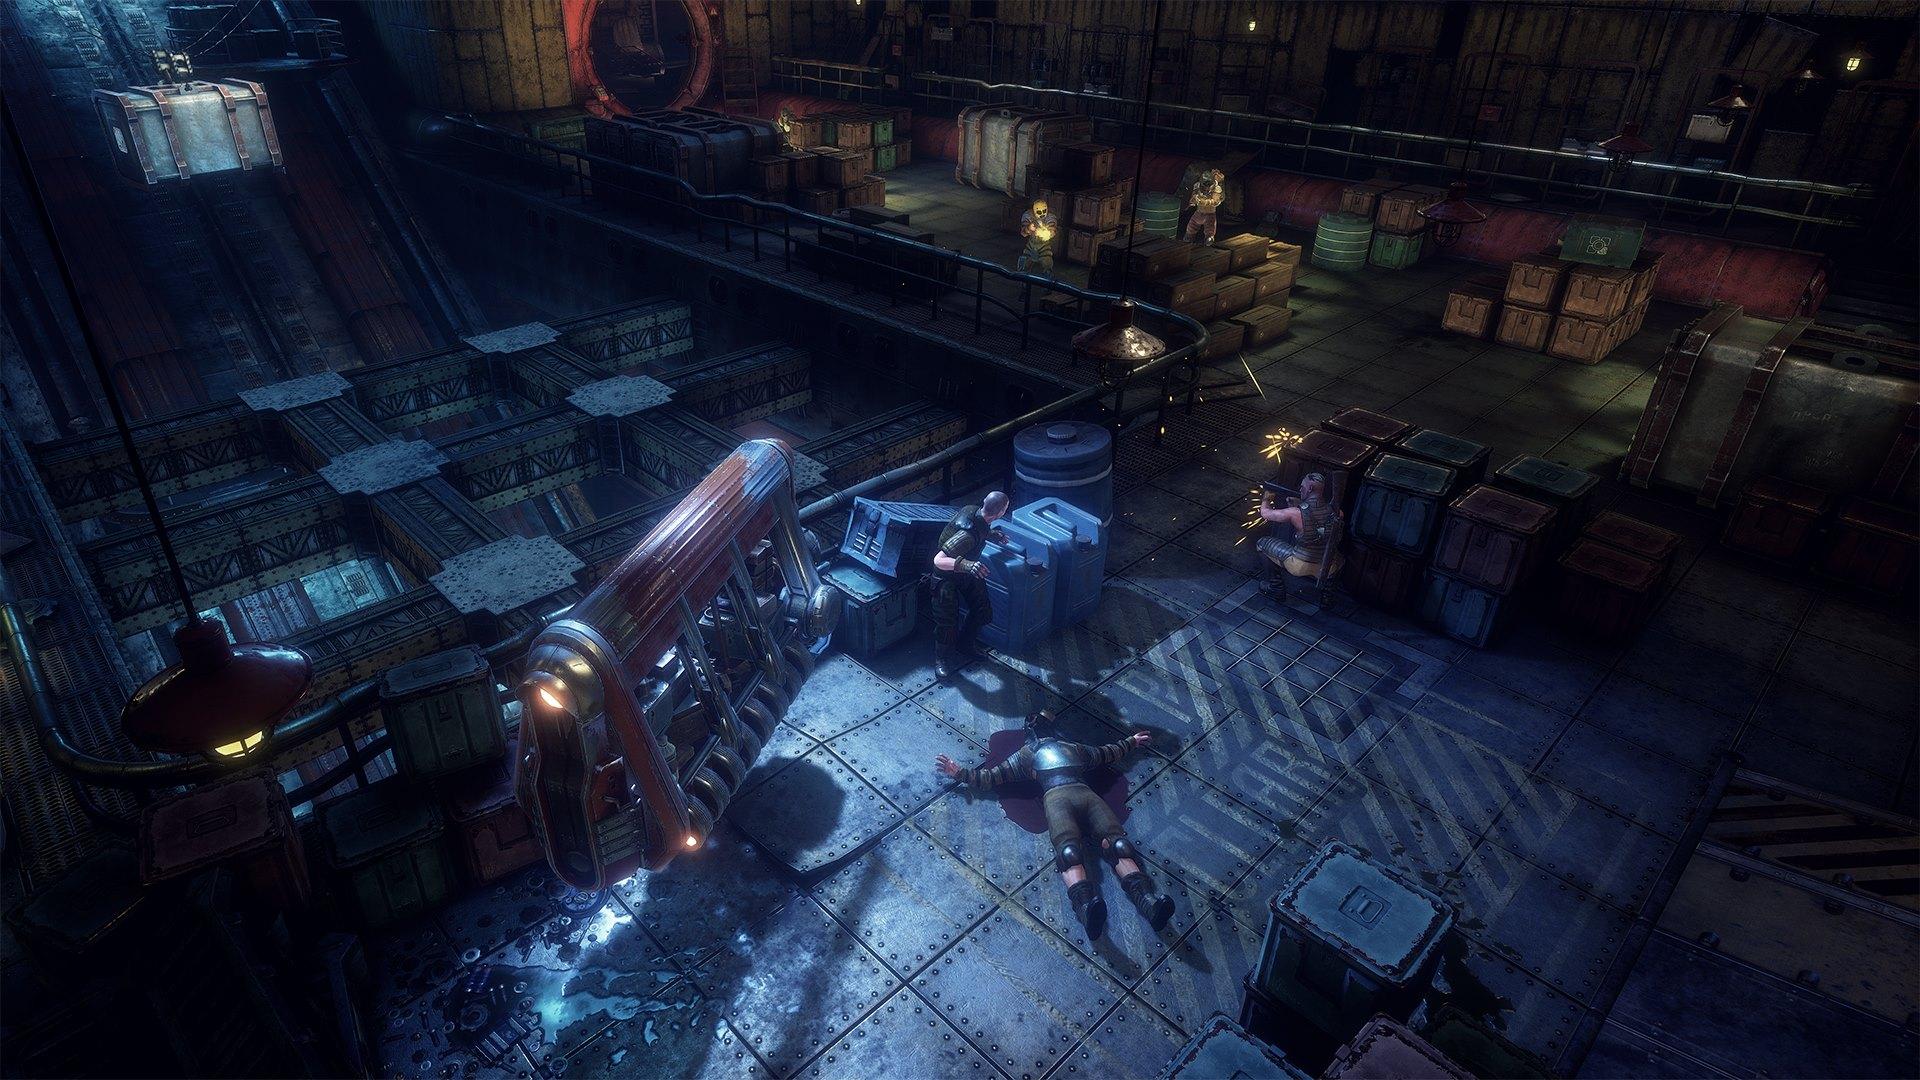 Insomnia: The Ark Screenshot 1 - Bilderquelle: HeroCraft